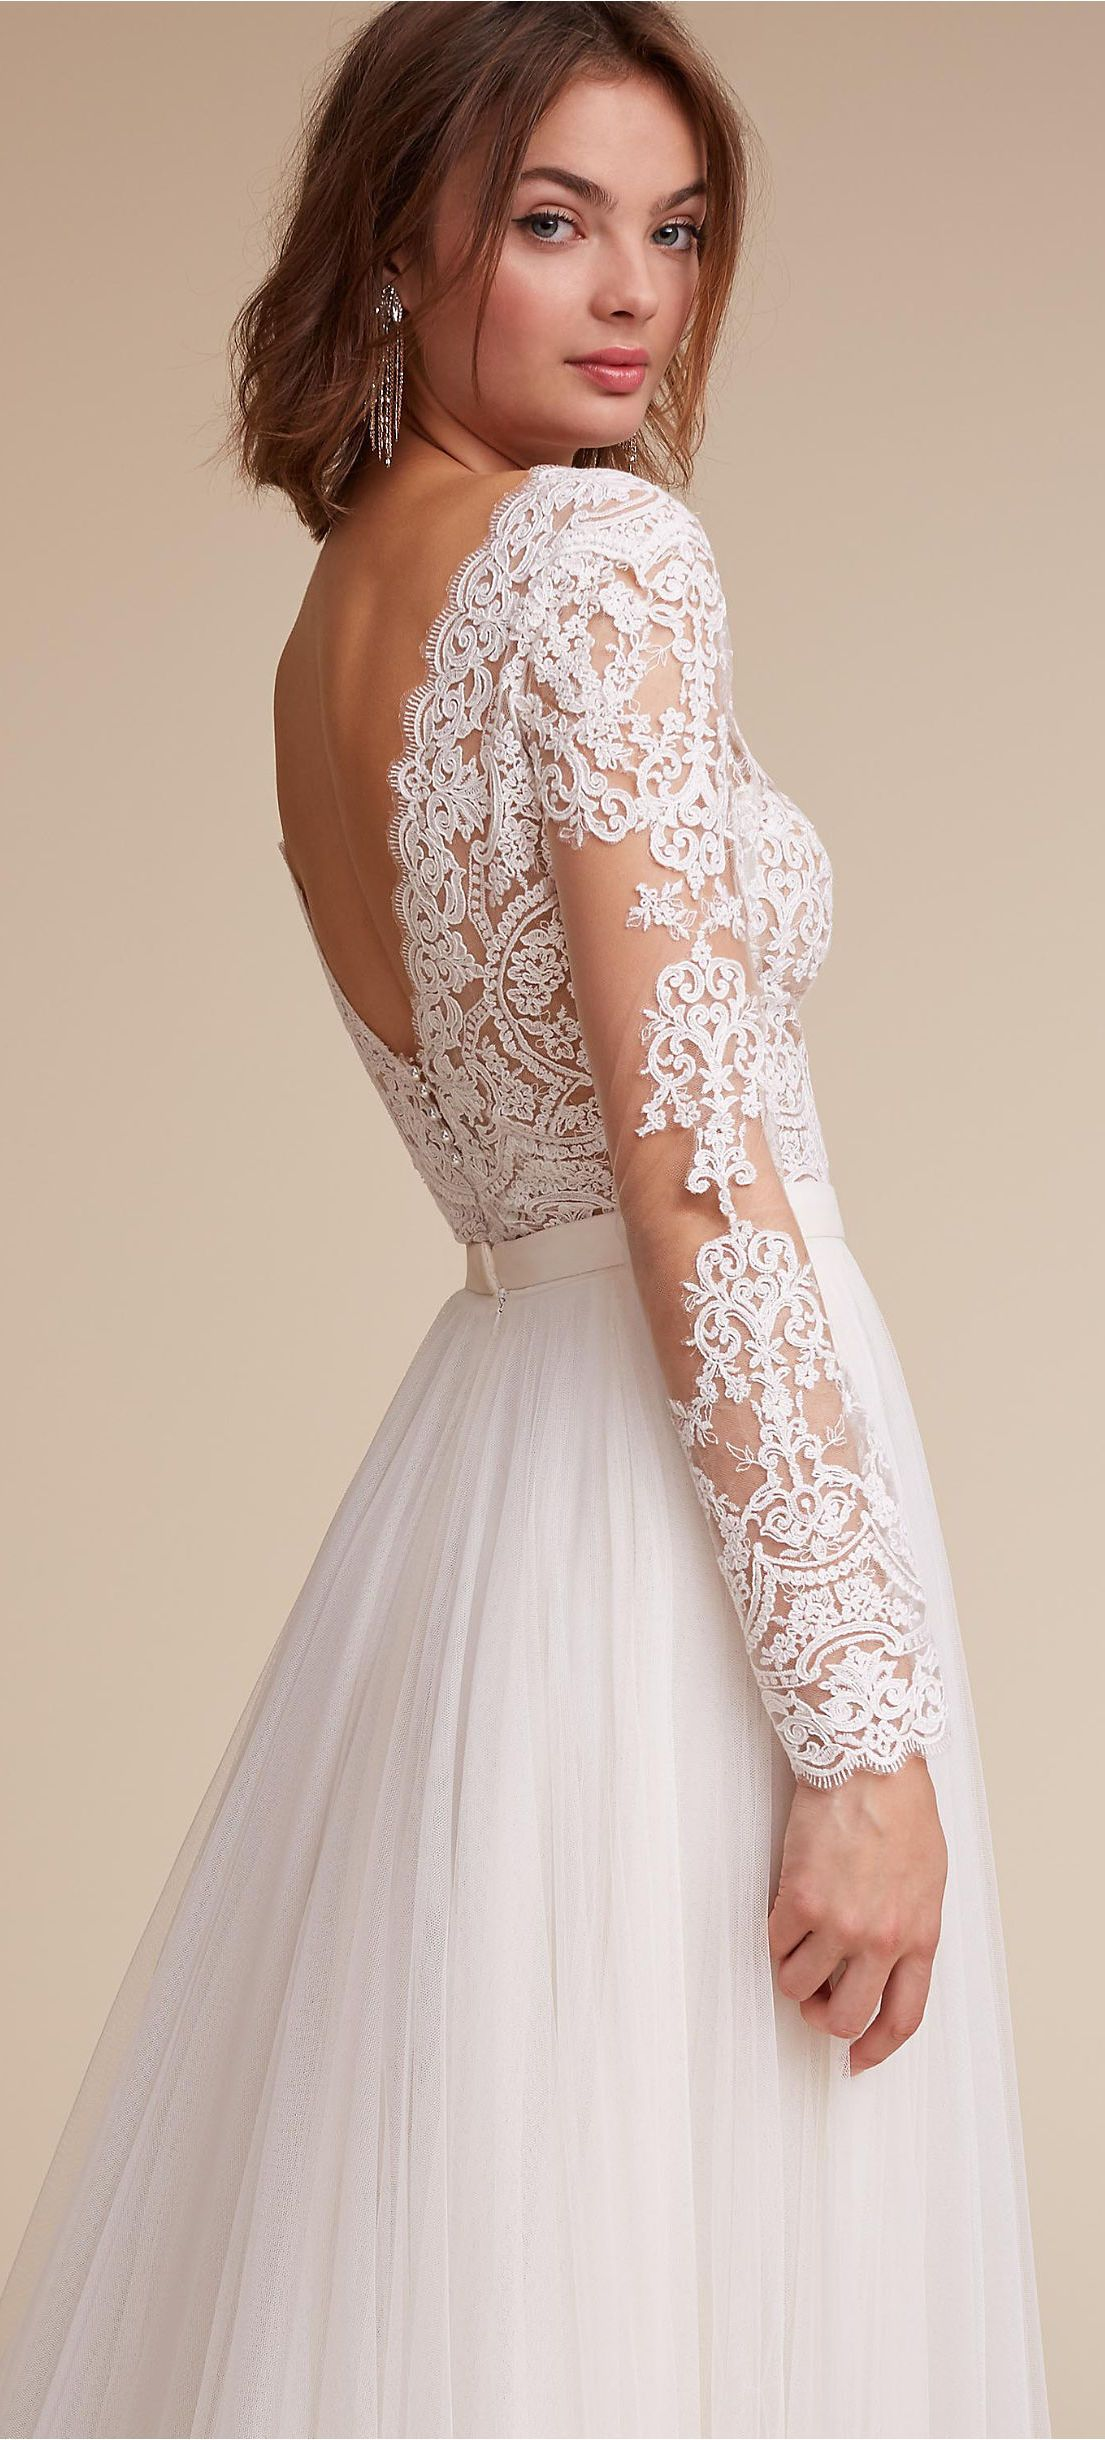 Long-sleeve lace wedding dress by BHLDN | Wedding Dresses ...